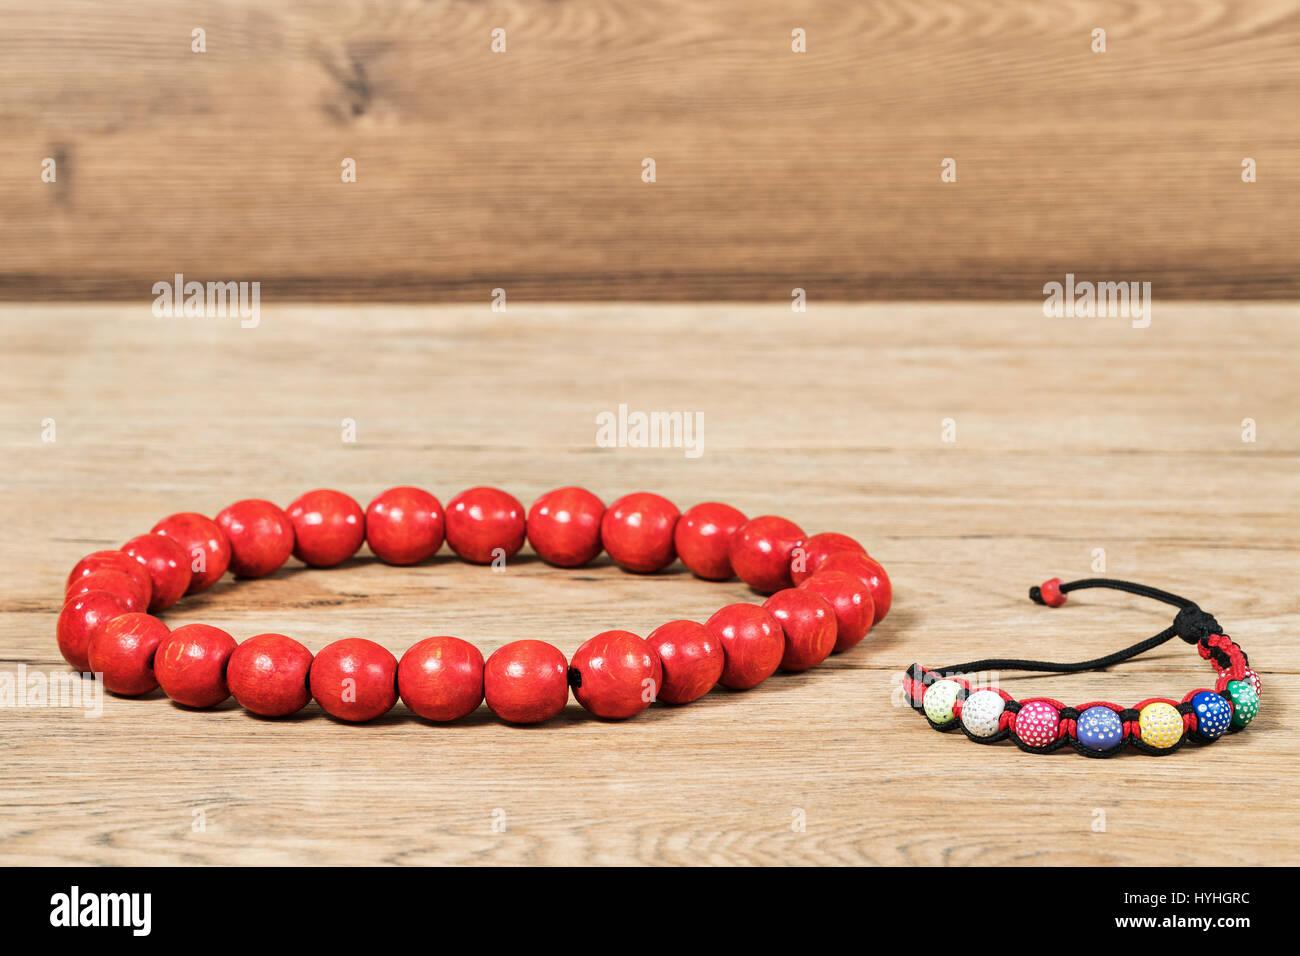 5b99d270b64c Wooden Bangle Beads Imágenes De Stock   Wooden Bangle Beads Fotos De ...